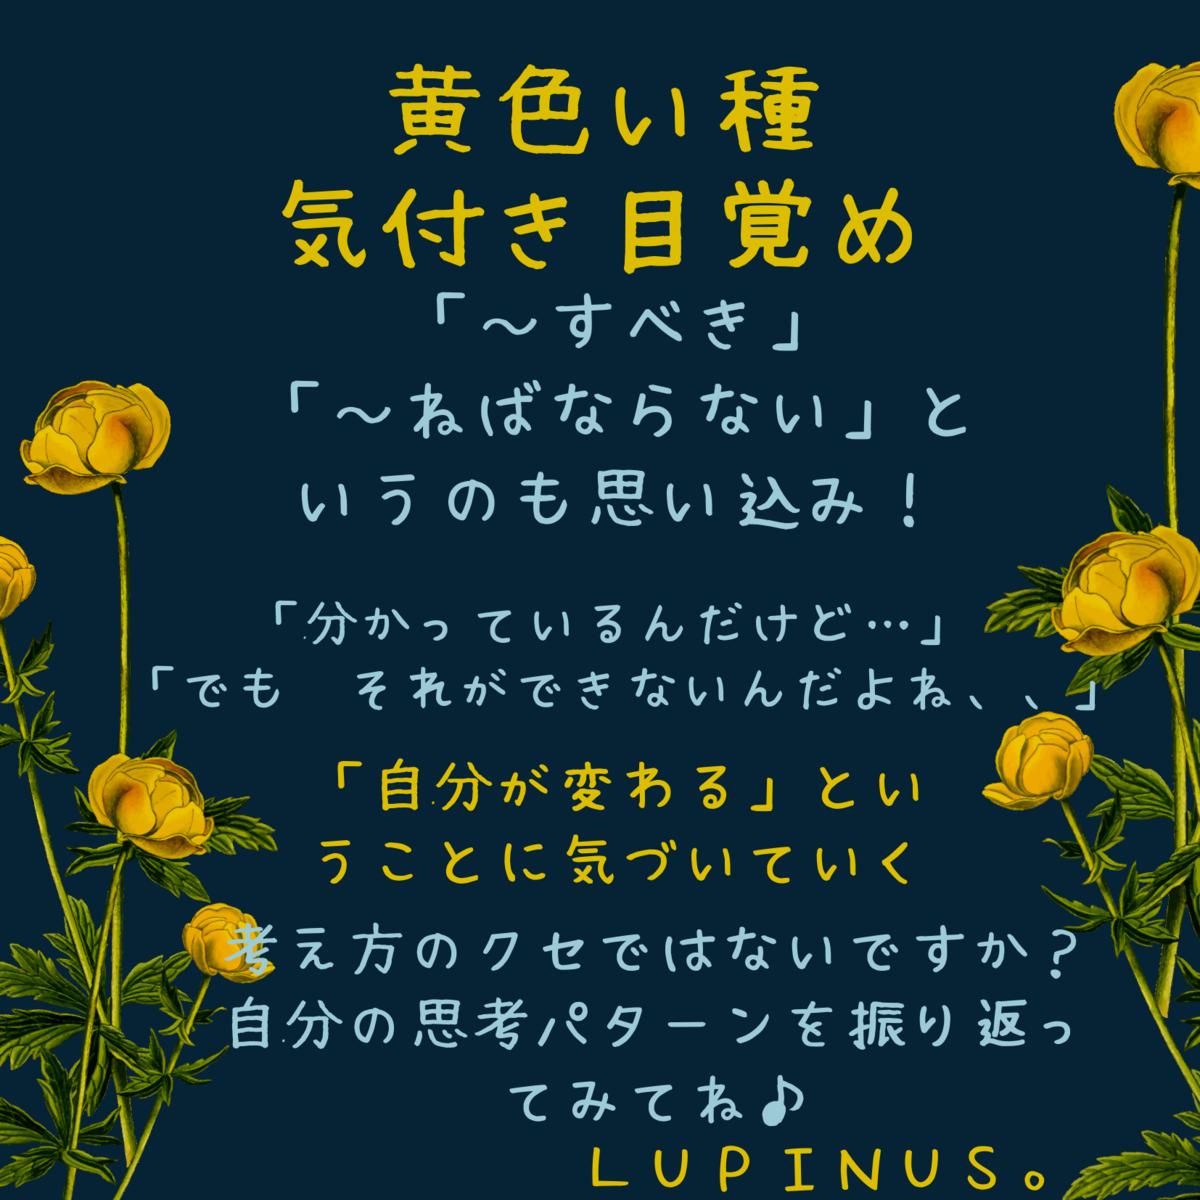 f:id:Lupinus104:20191202221945p:plain